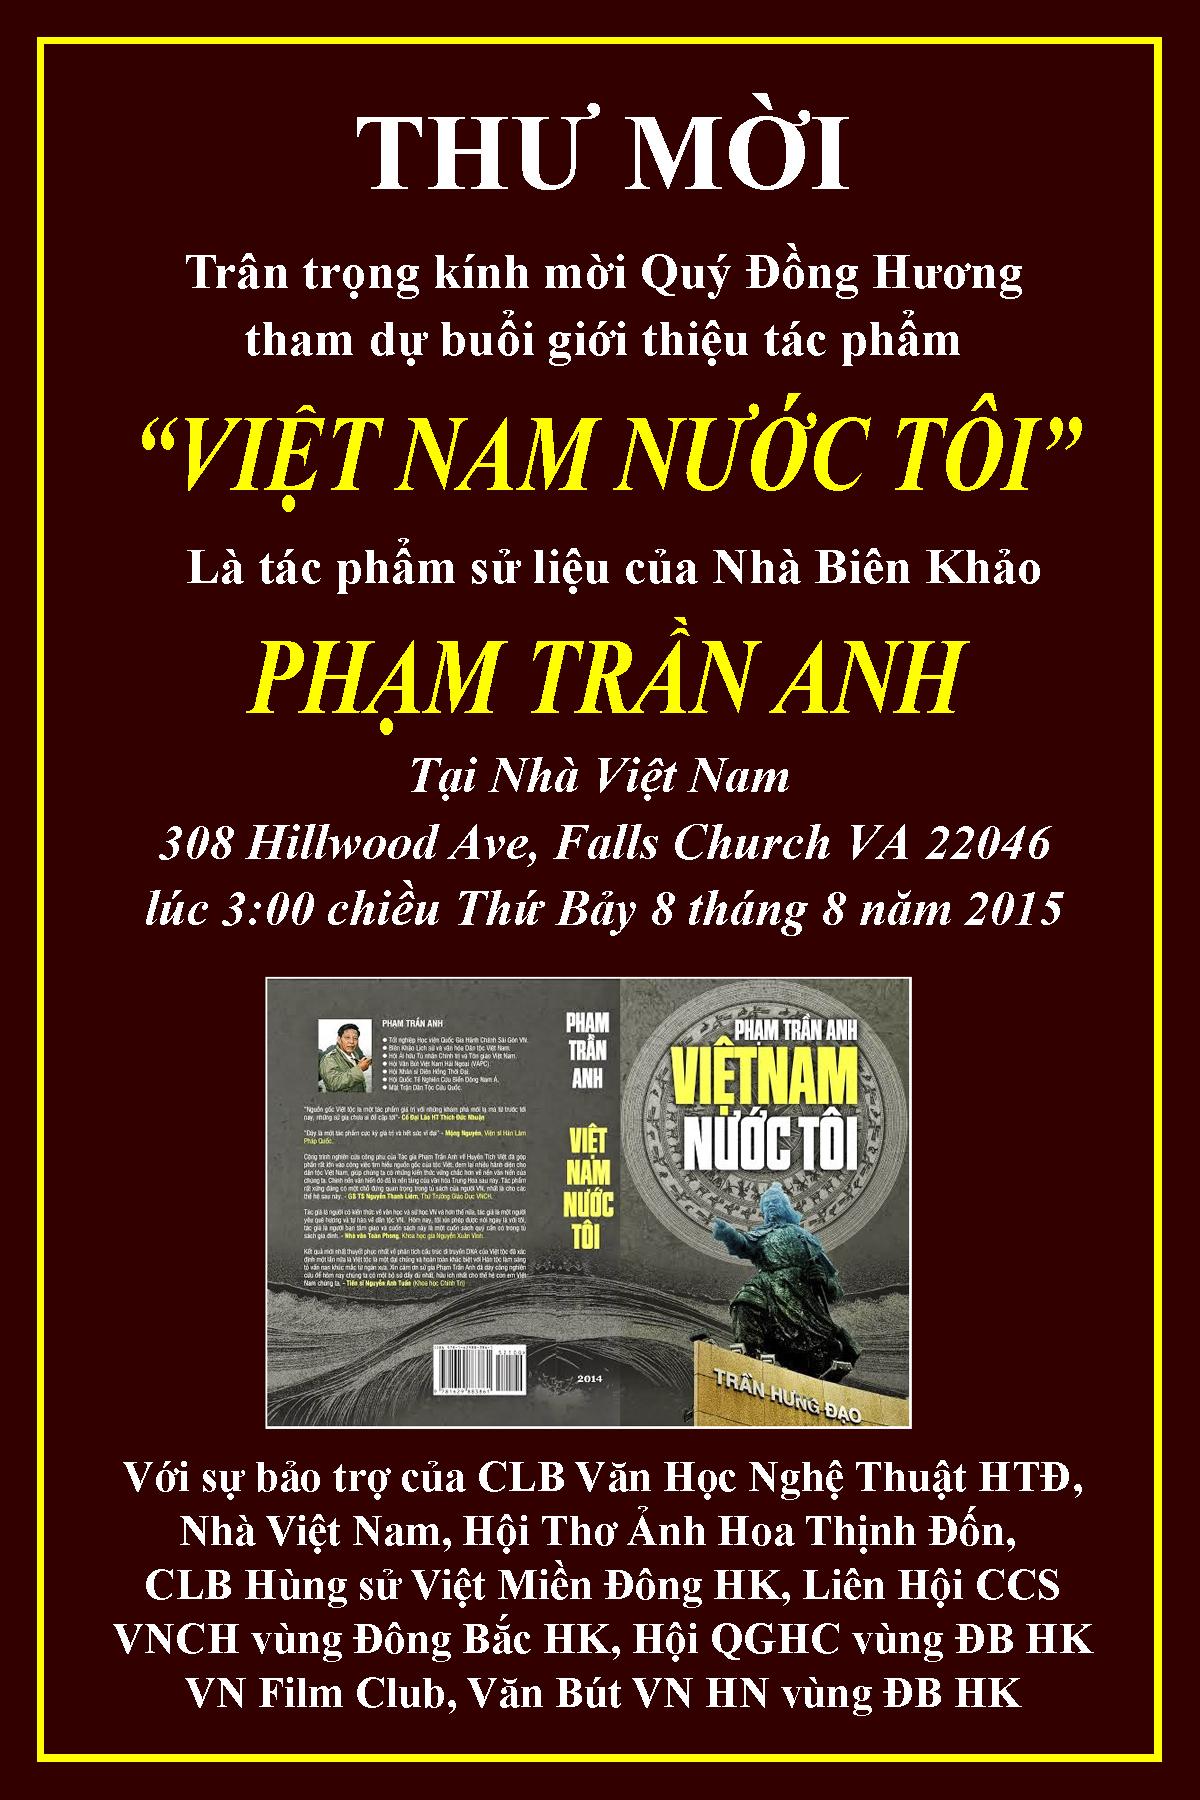 Thu Moi Ra Mat Sach Viet Nam Nuoc Toi - Pham Tran Anh